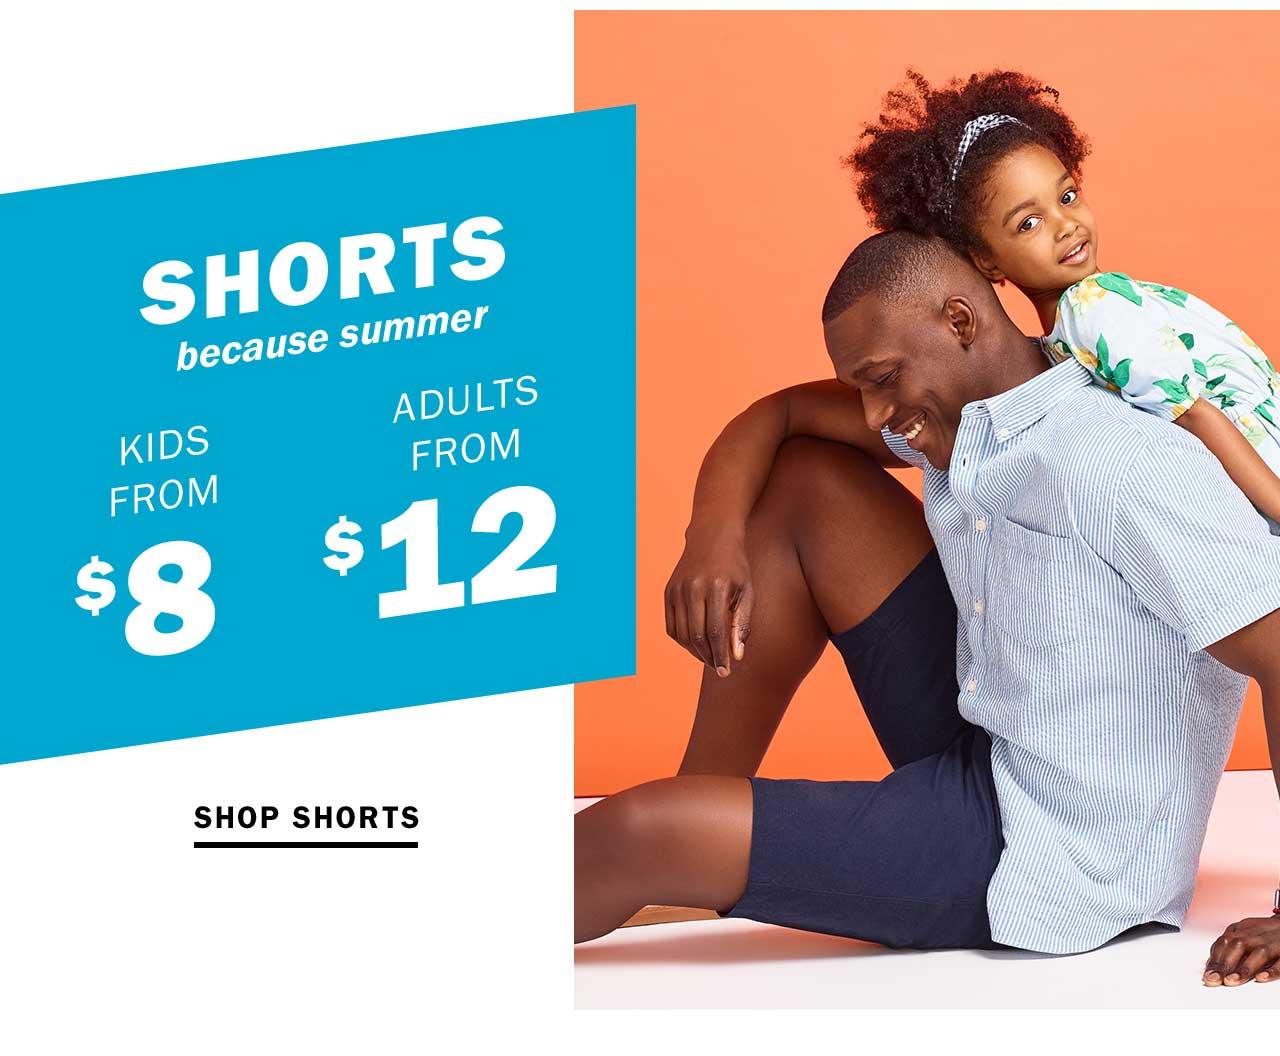 SHORTS | SHOP SHORTS